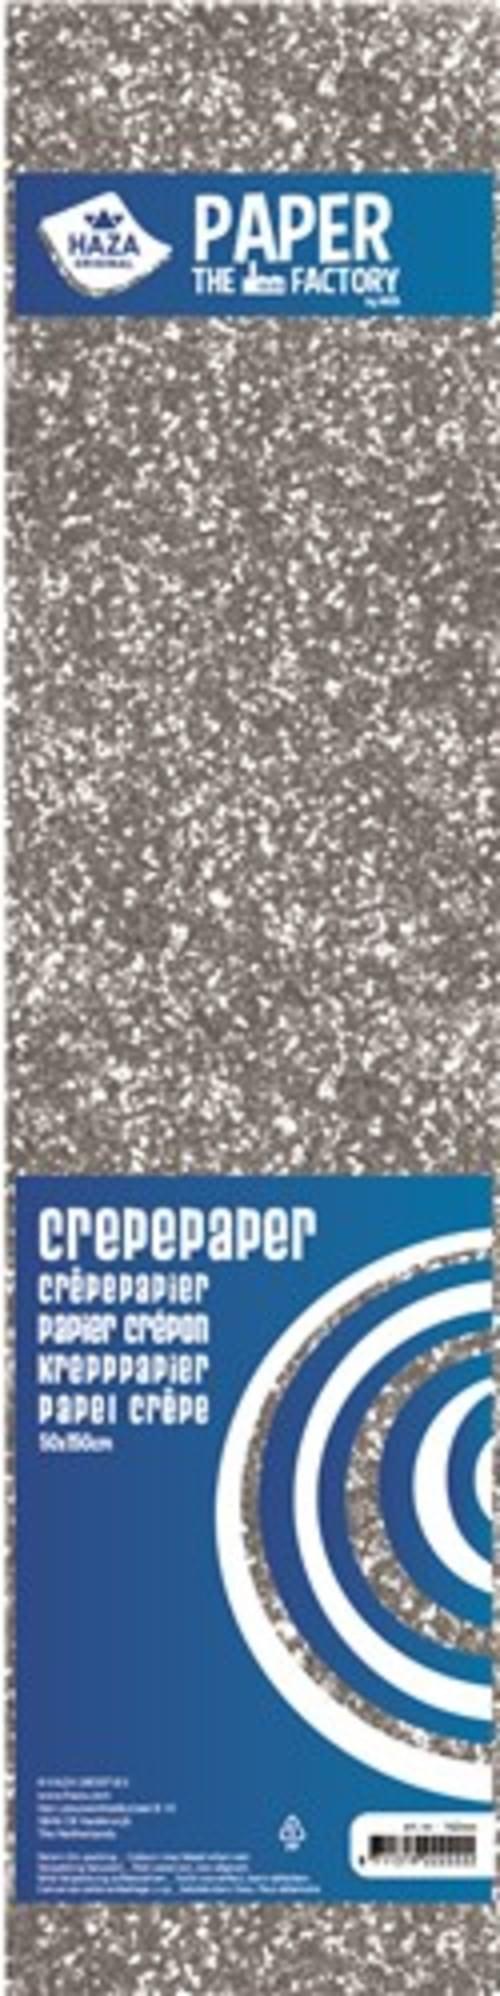 Alu-Crepe Silver